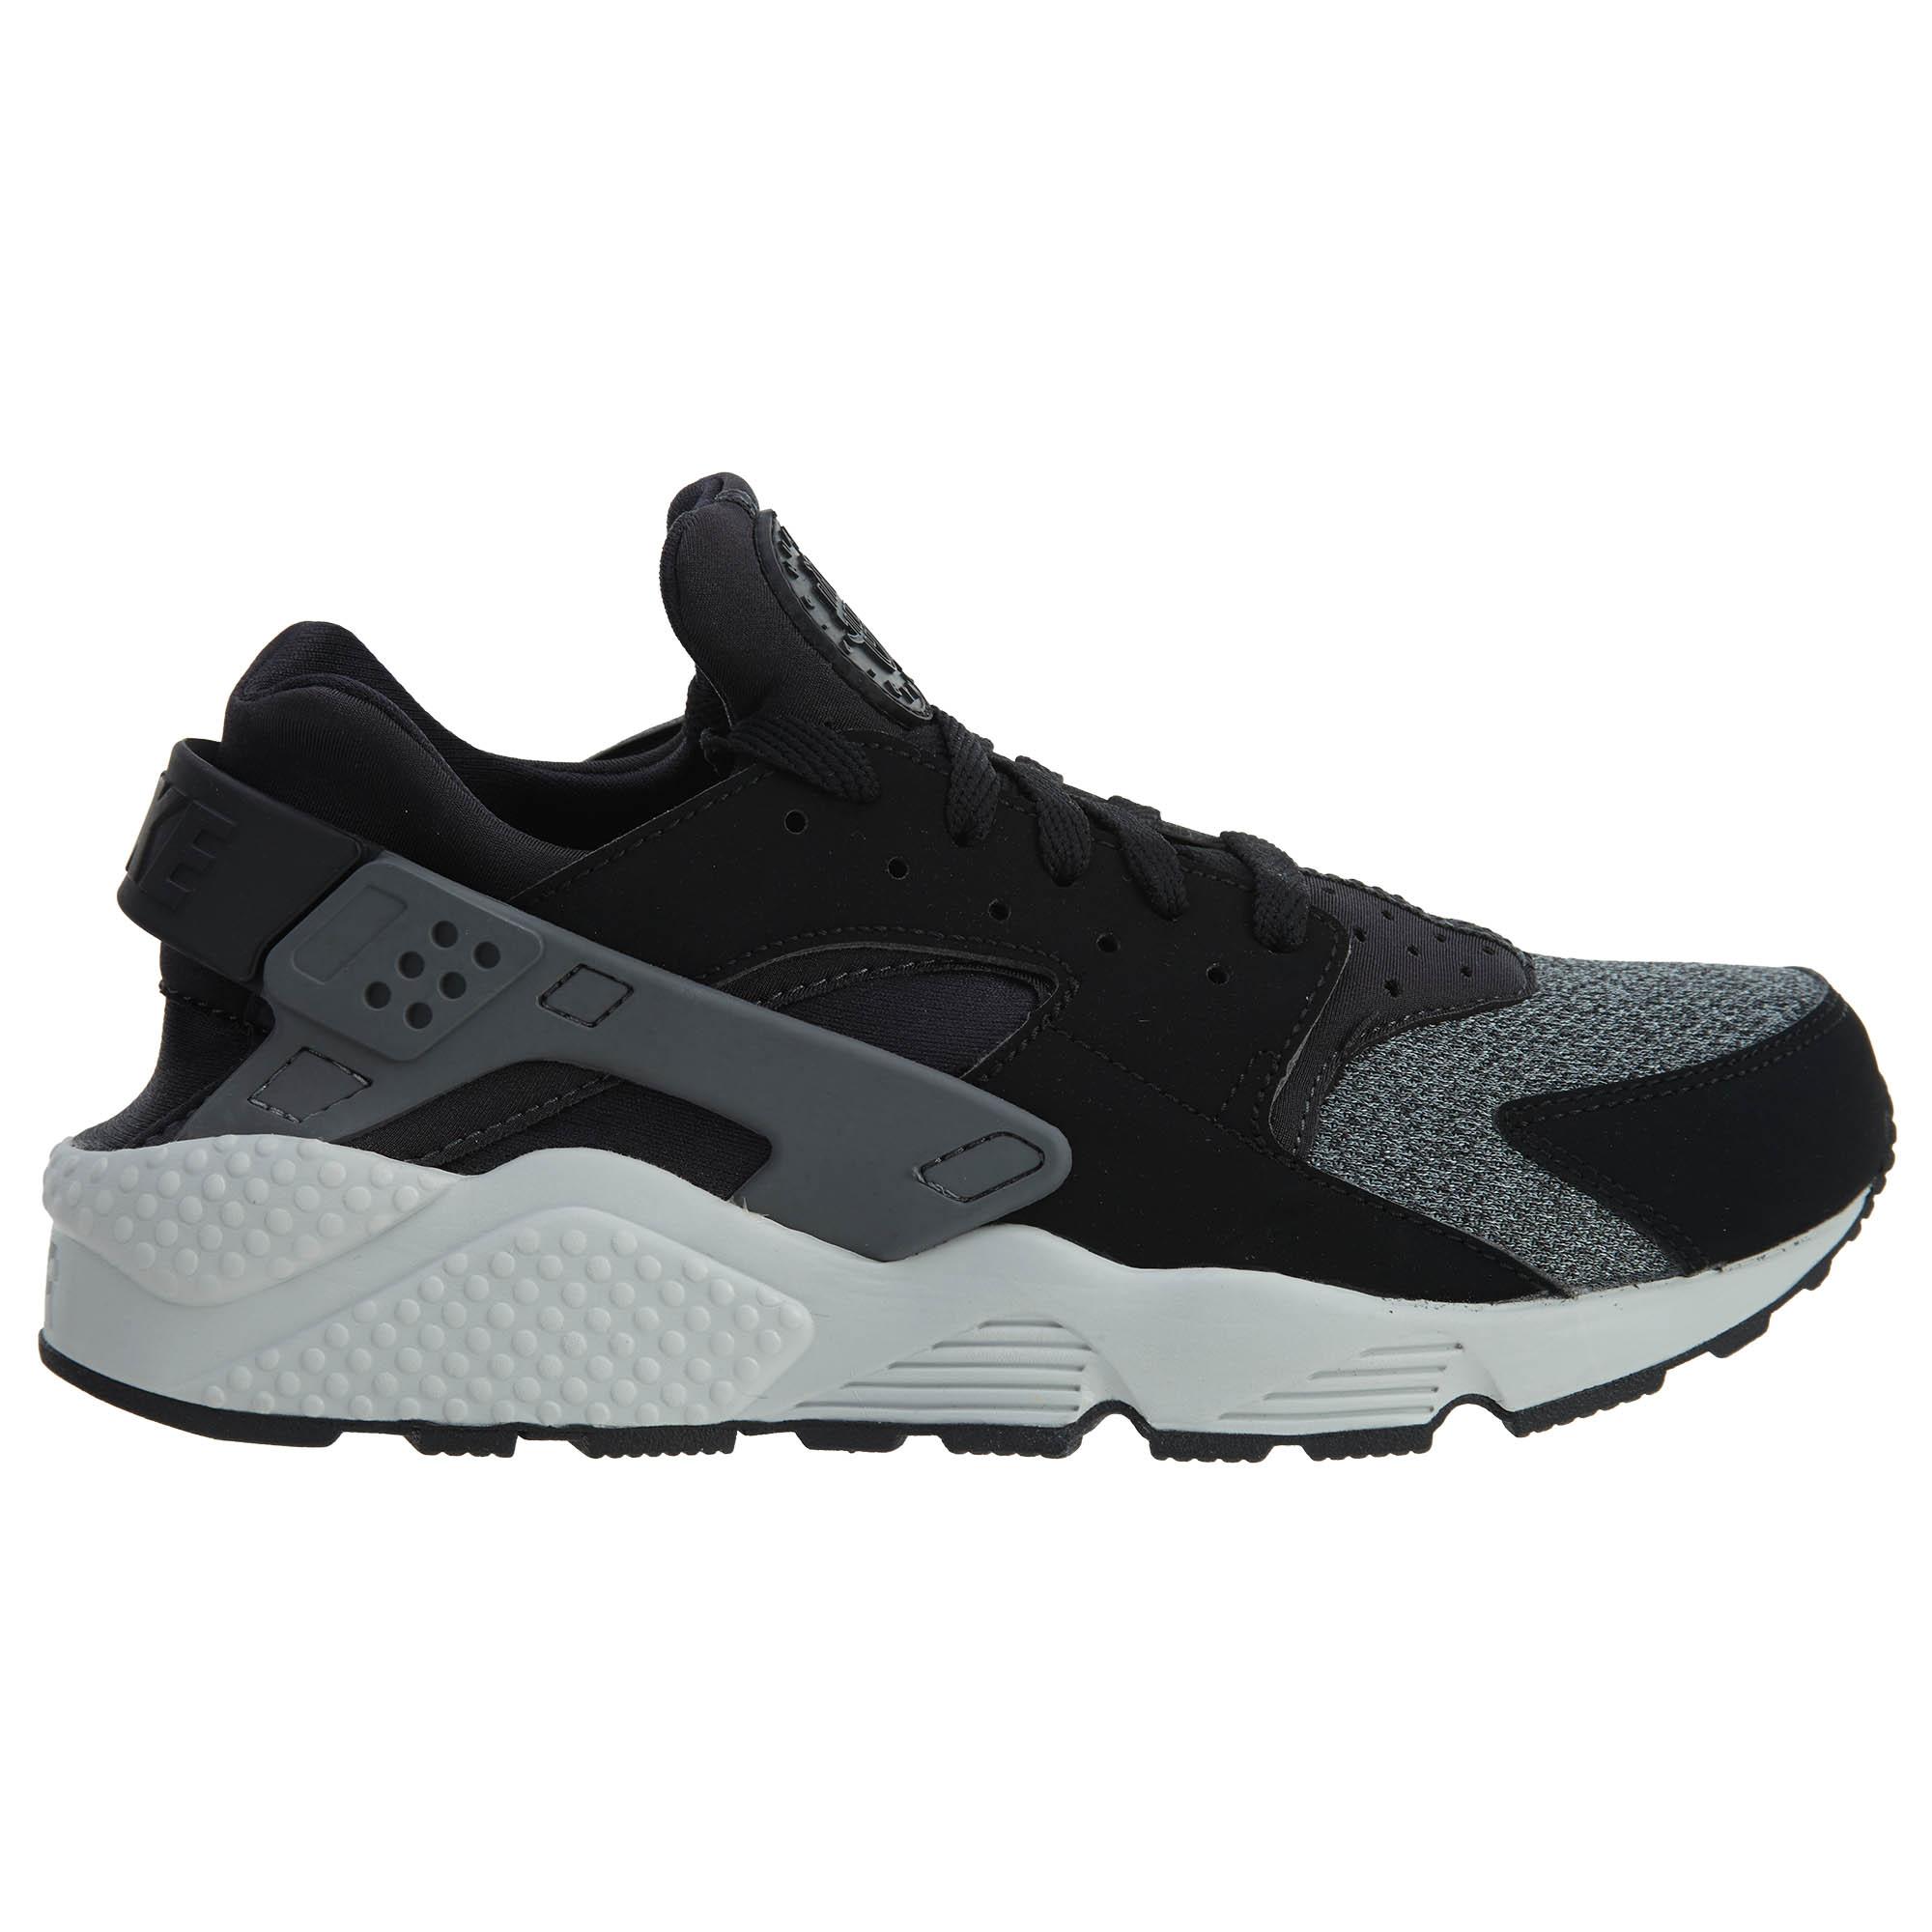 Nike Air Huarache Black/Anthracite/Purple Platinum - 318429-039